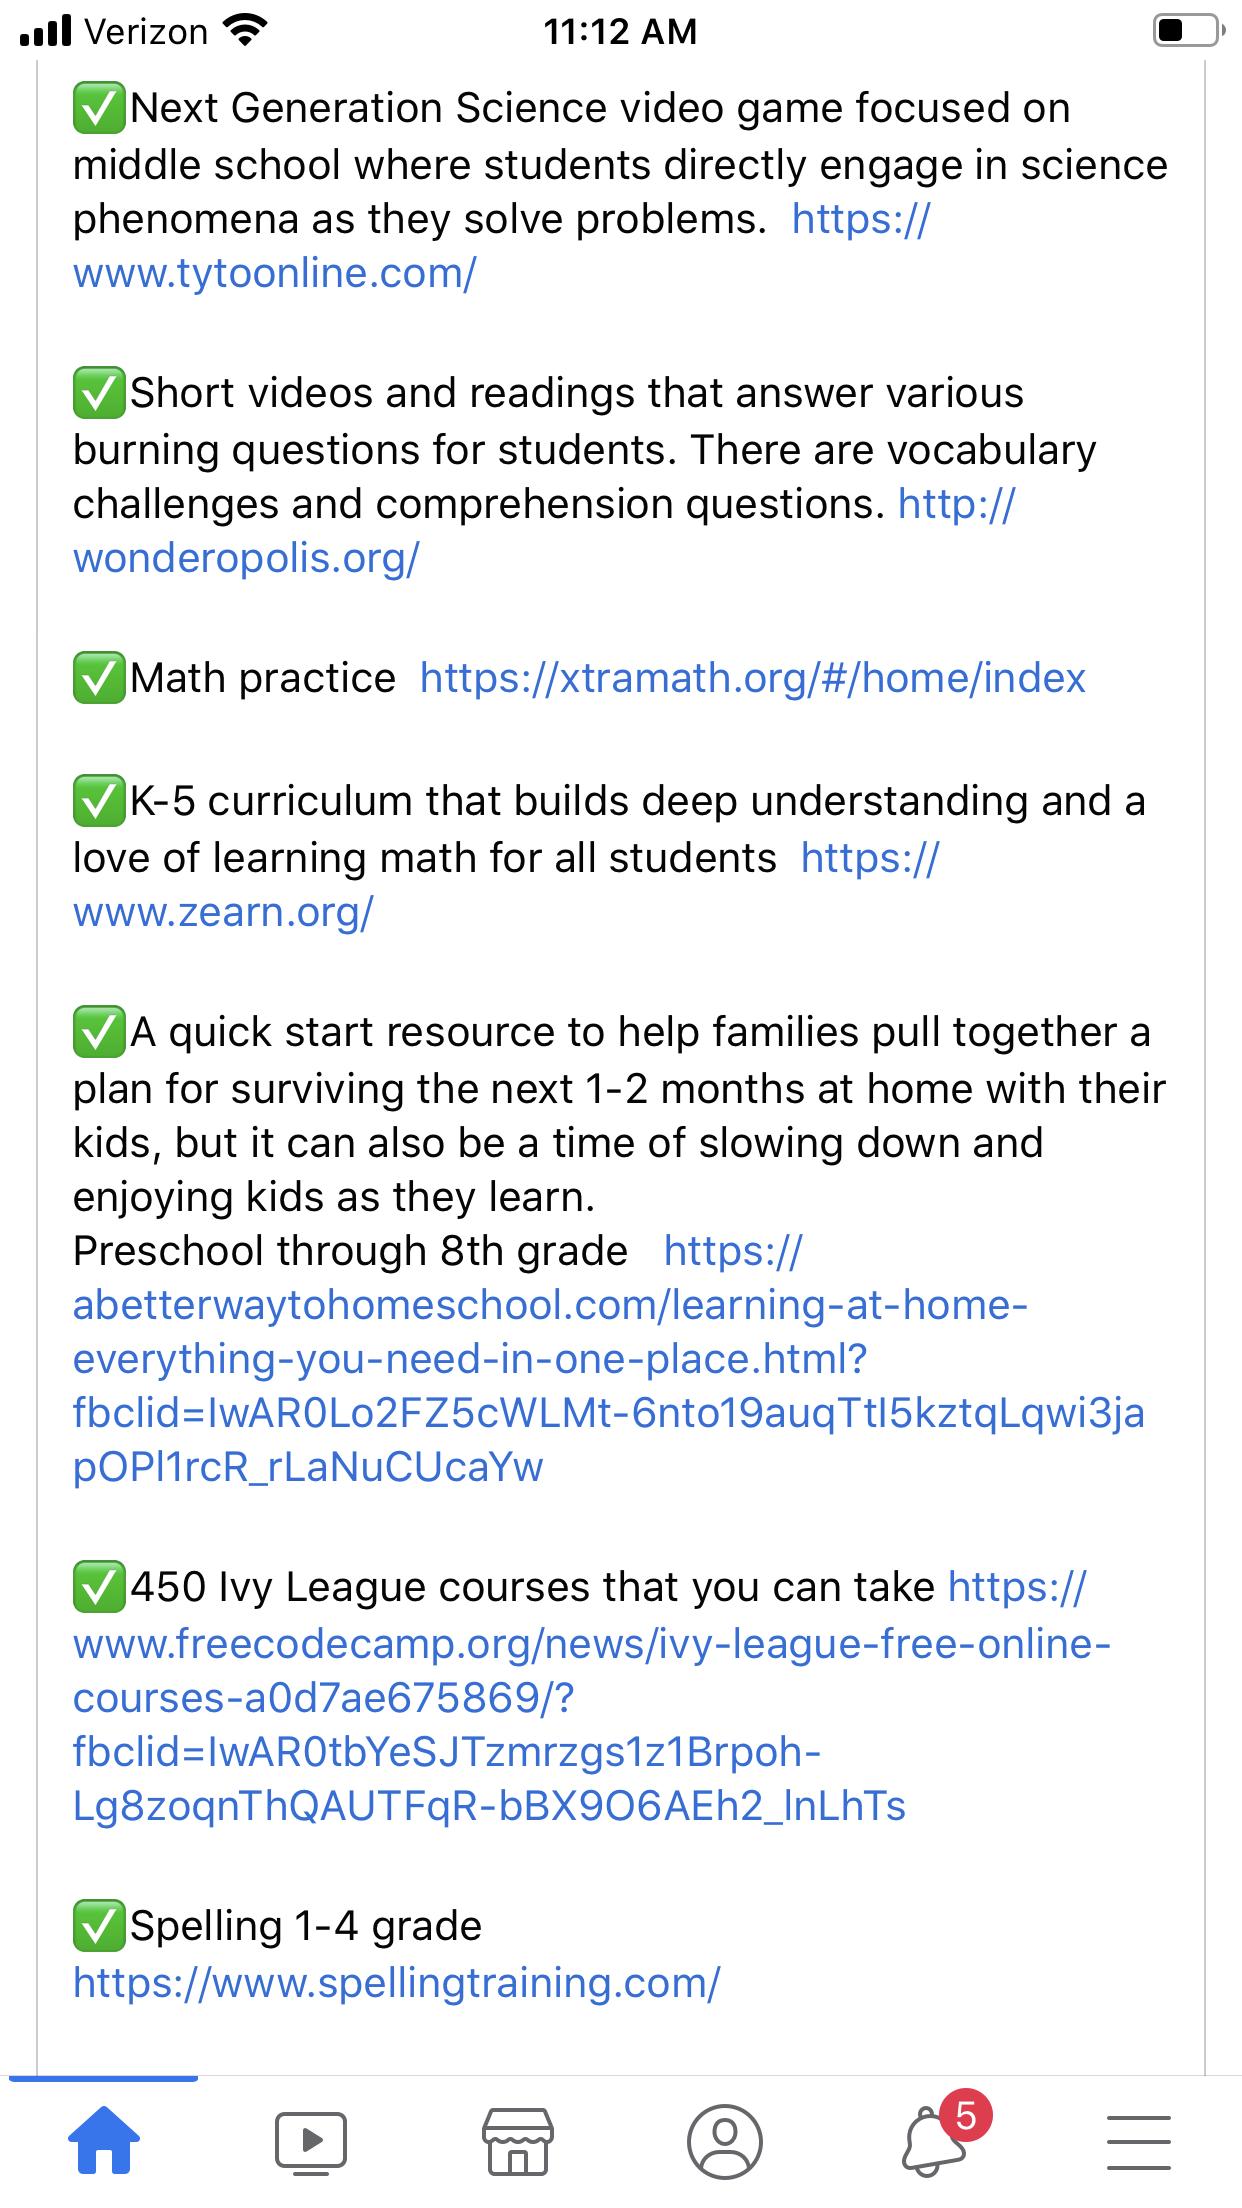 Pin By Dmtamari On Homeschool Resources Science Videos Math Practices Homeschool Resources [ 2208 x 1242 Pixel ]